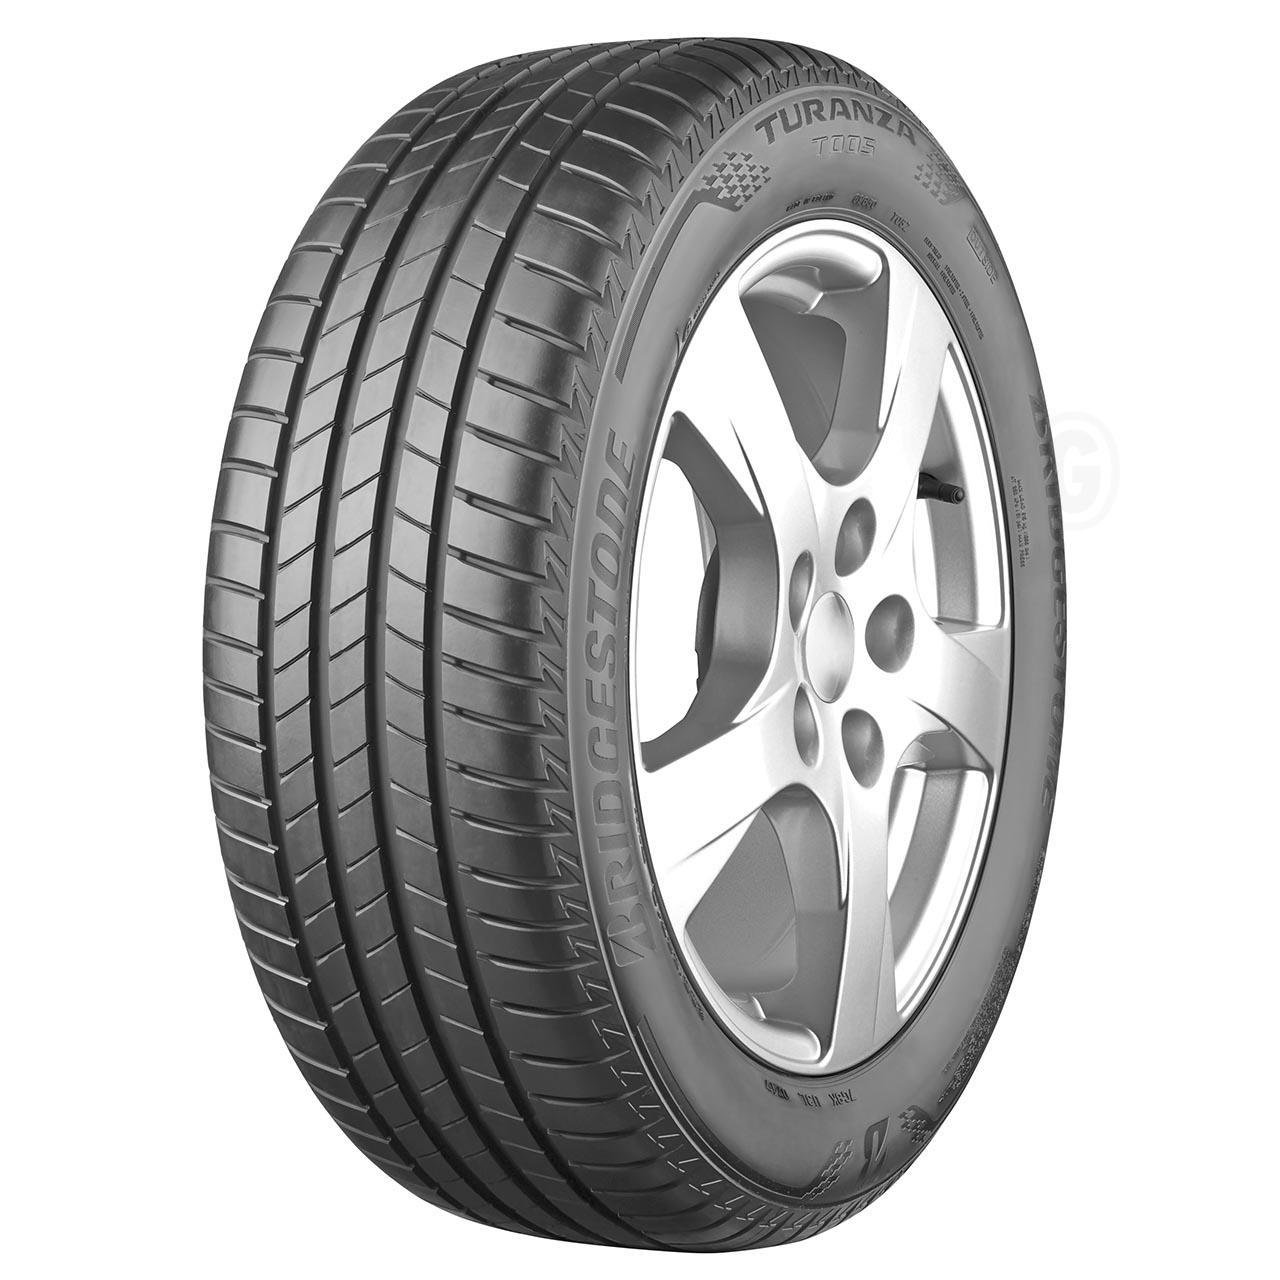 Bridgestone Turanza T005 205/55R16 91V